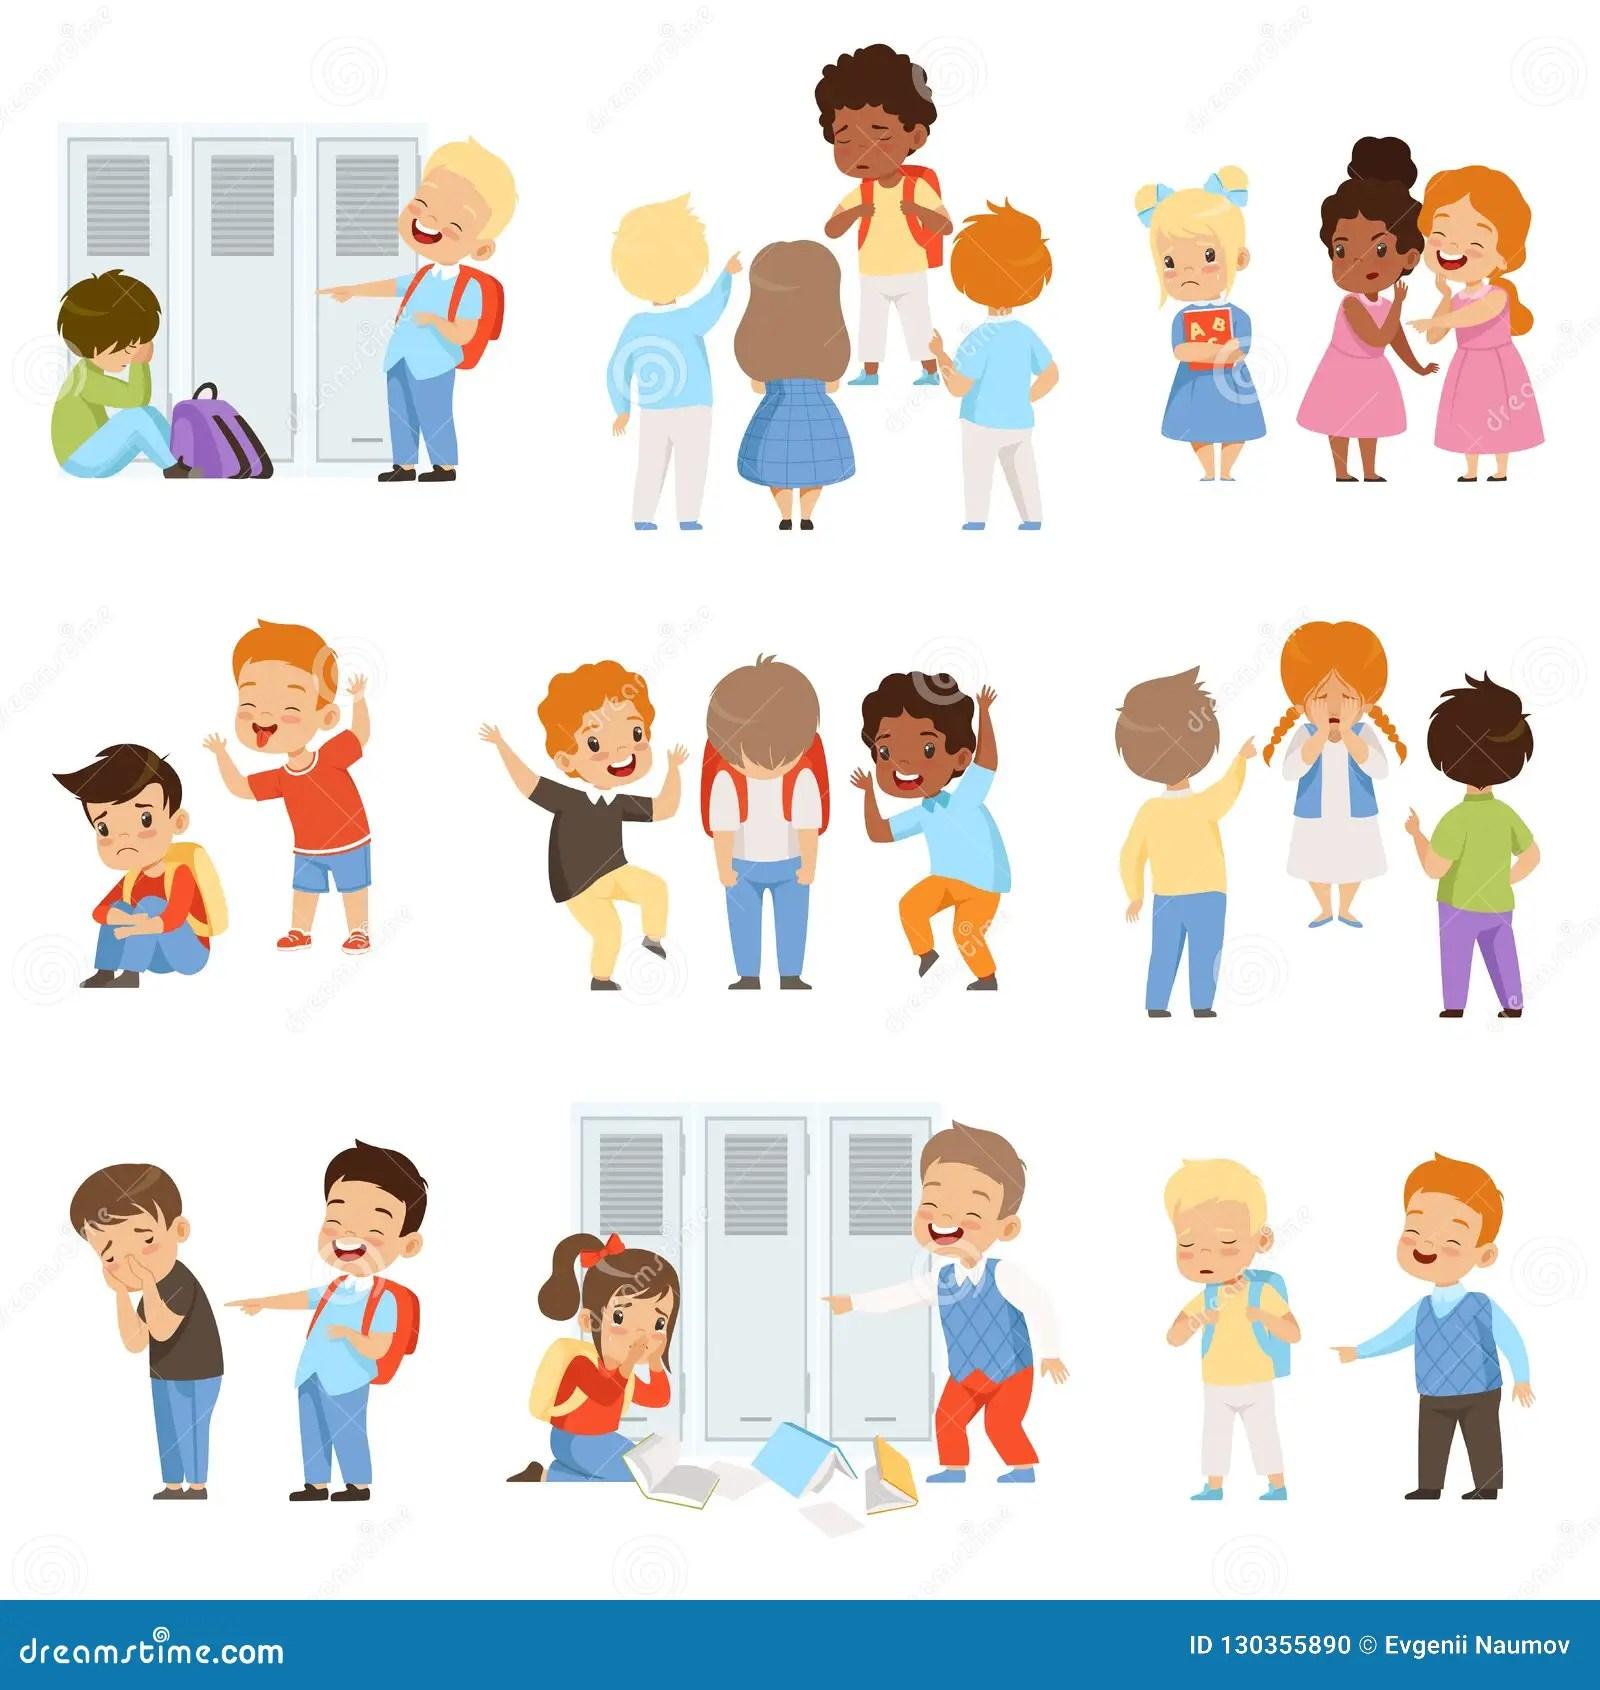 Kids Bullying The Weaks Set Bad Behavior Conflict